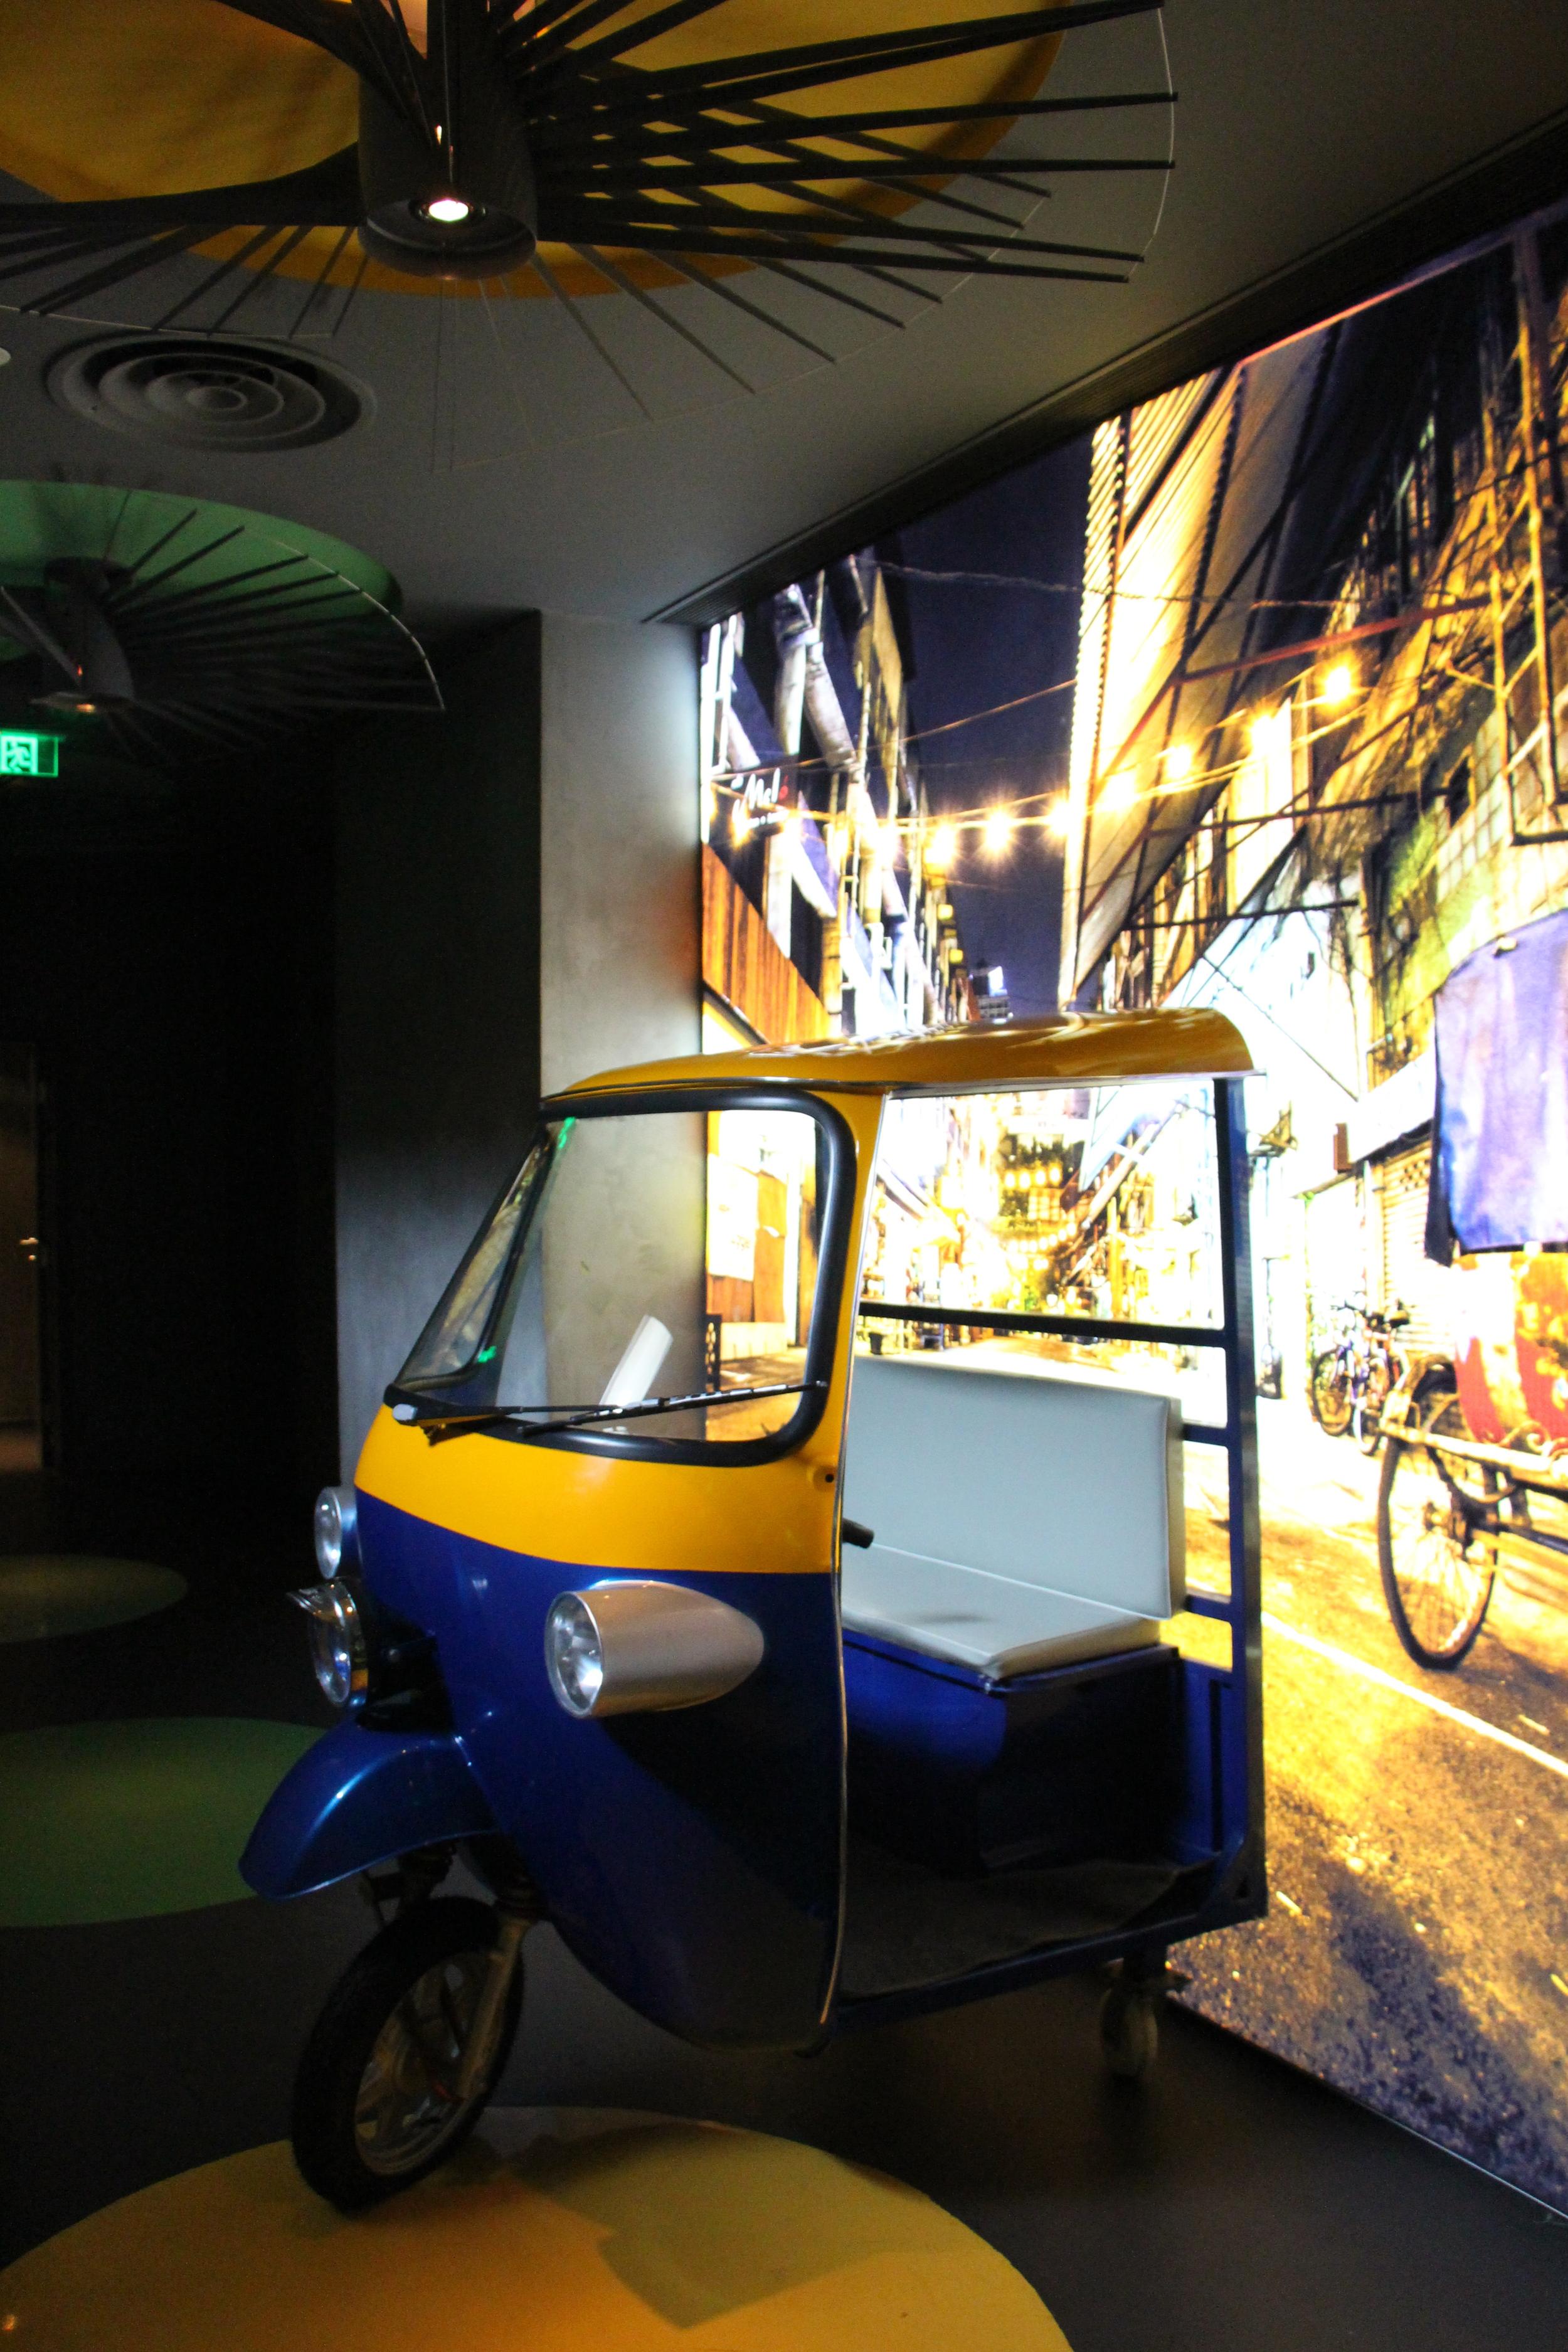 Half a tuktuk with a Bangkok background upon entrance